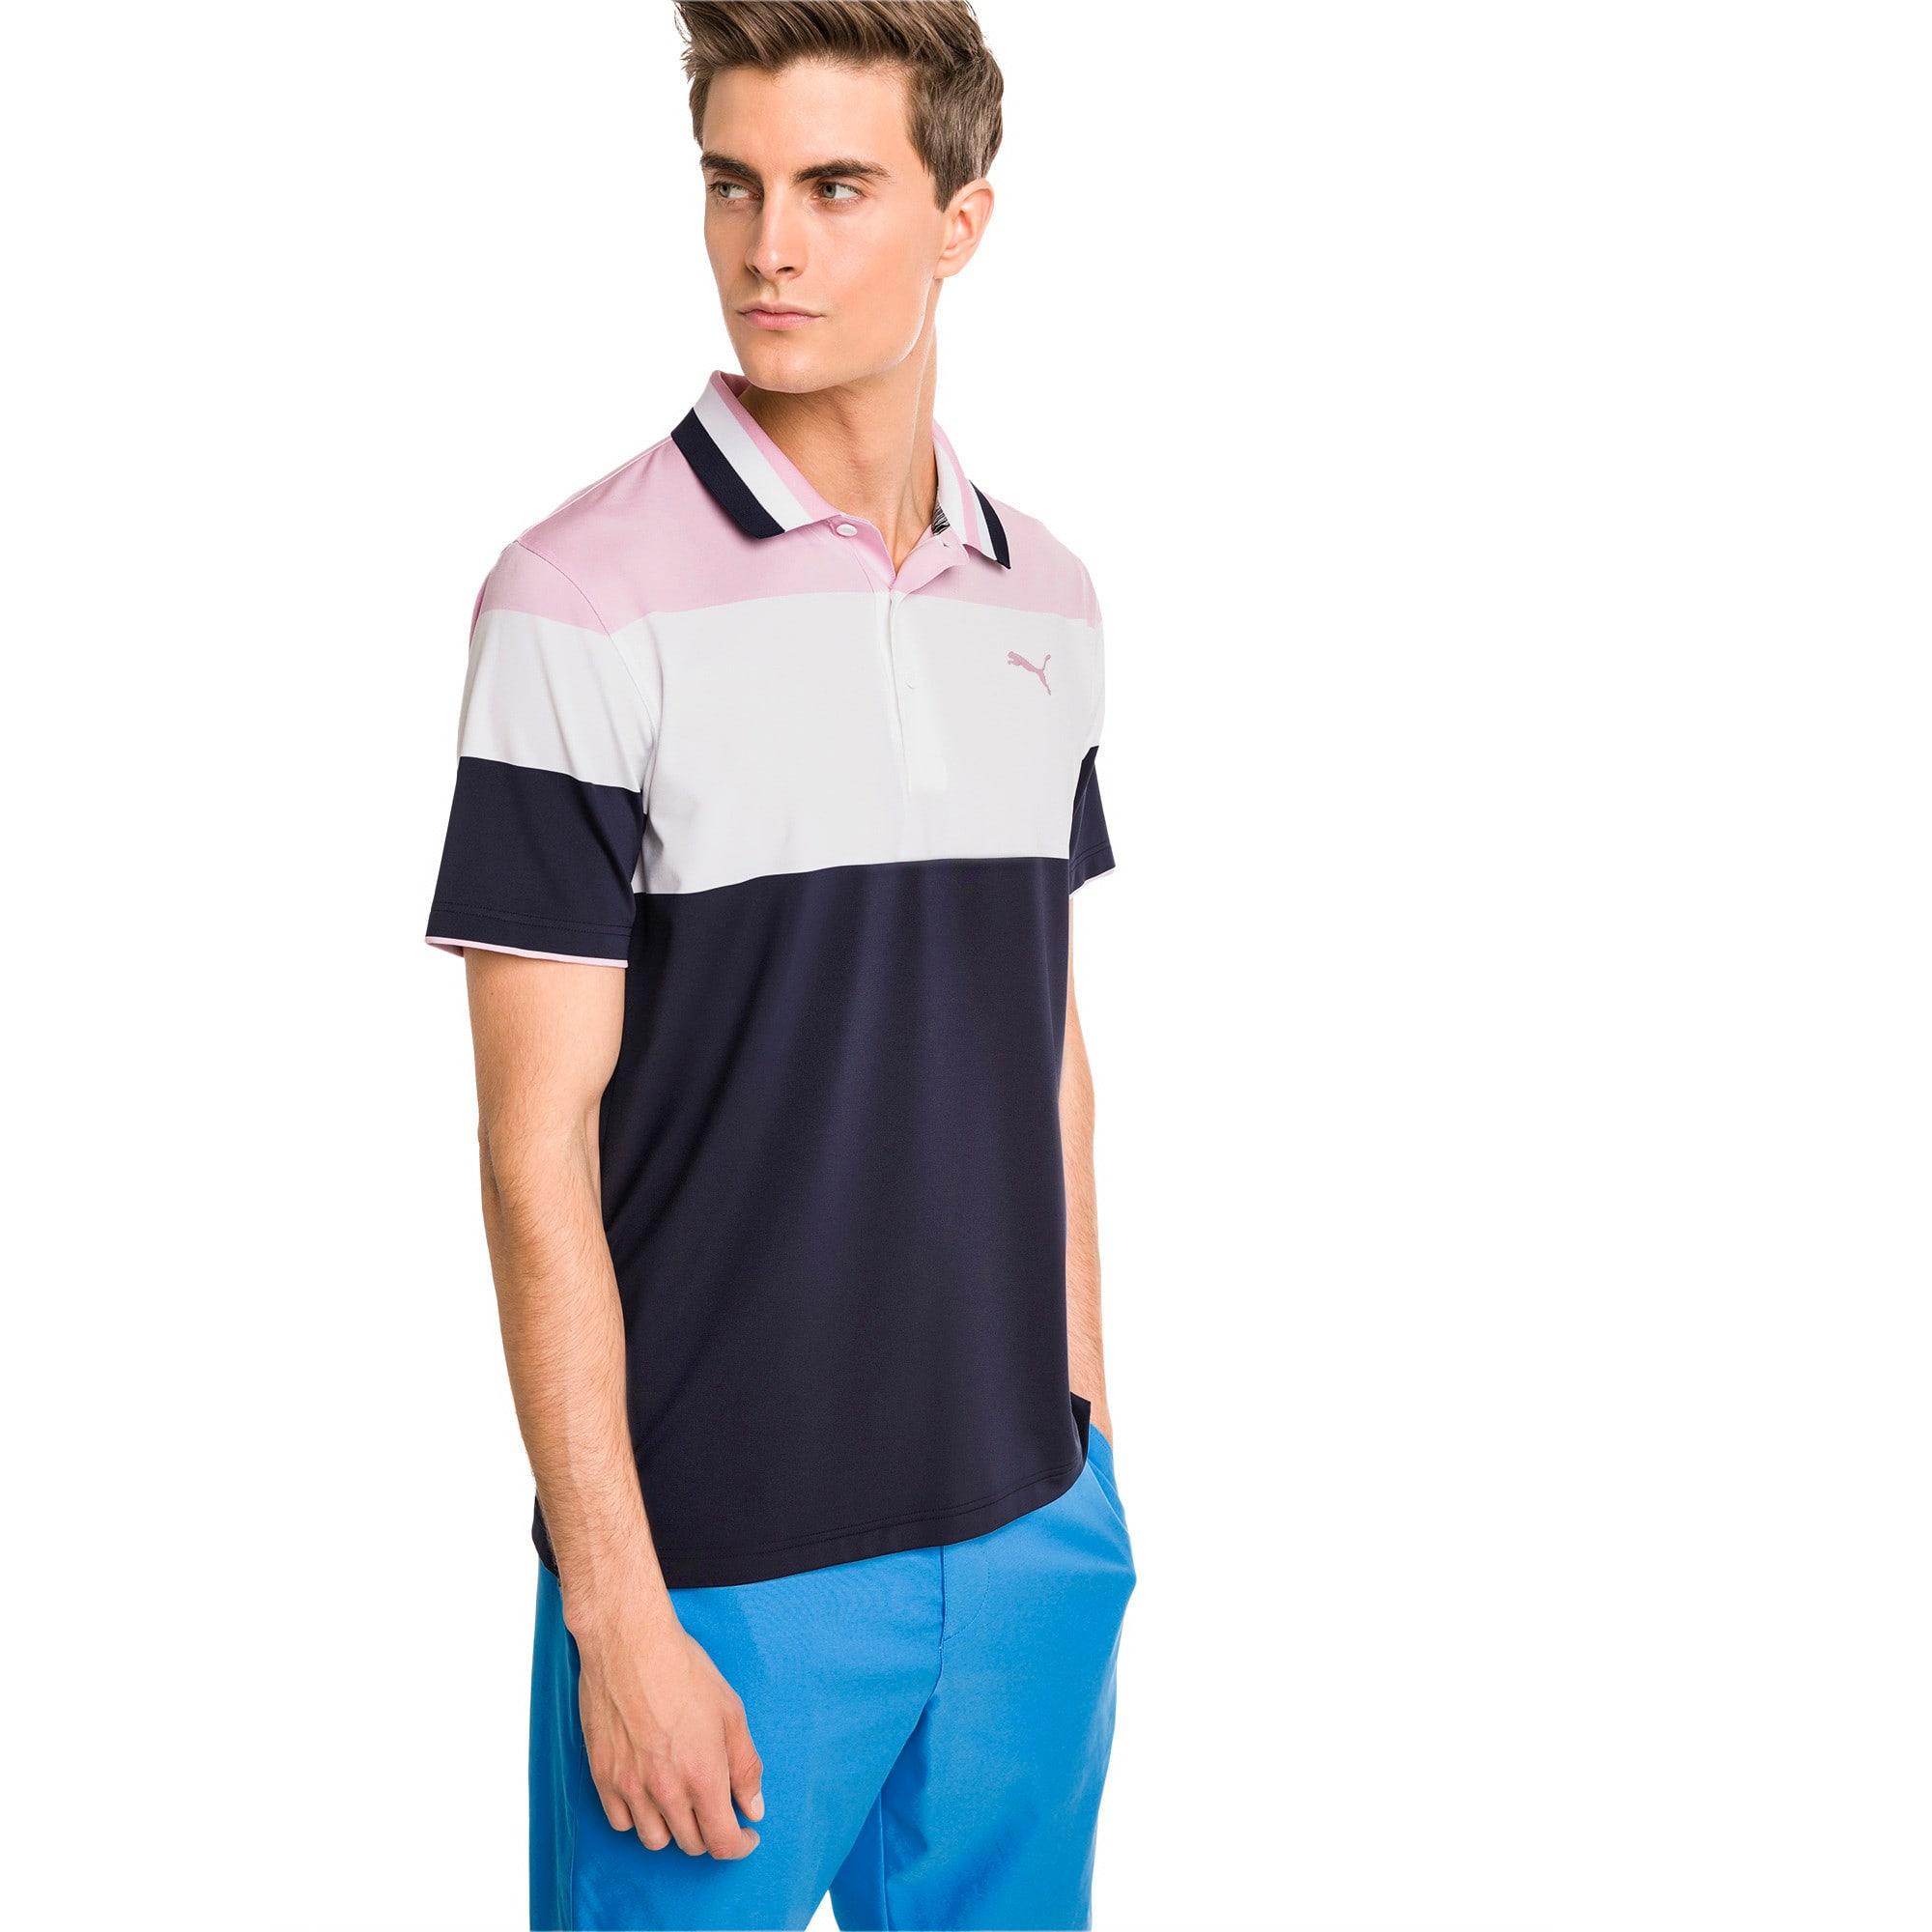 Thumbnail 1 of Nineties Men's Golf Polo, Pale Pink, medium